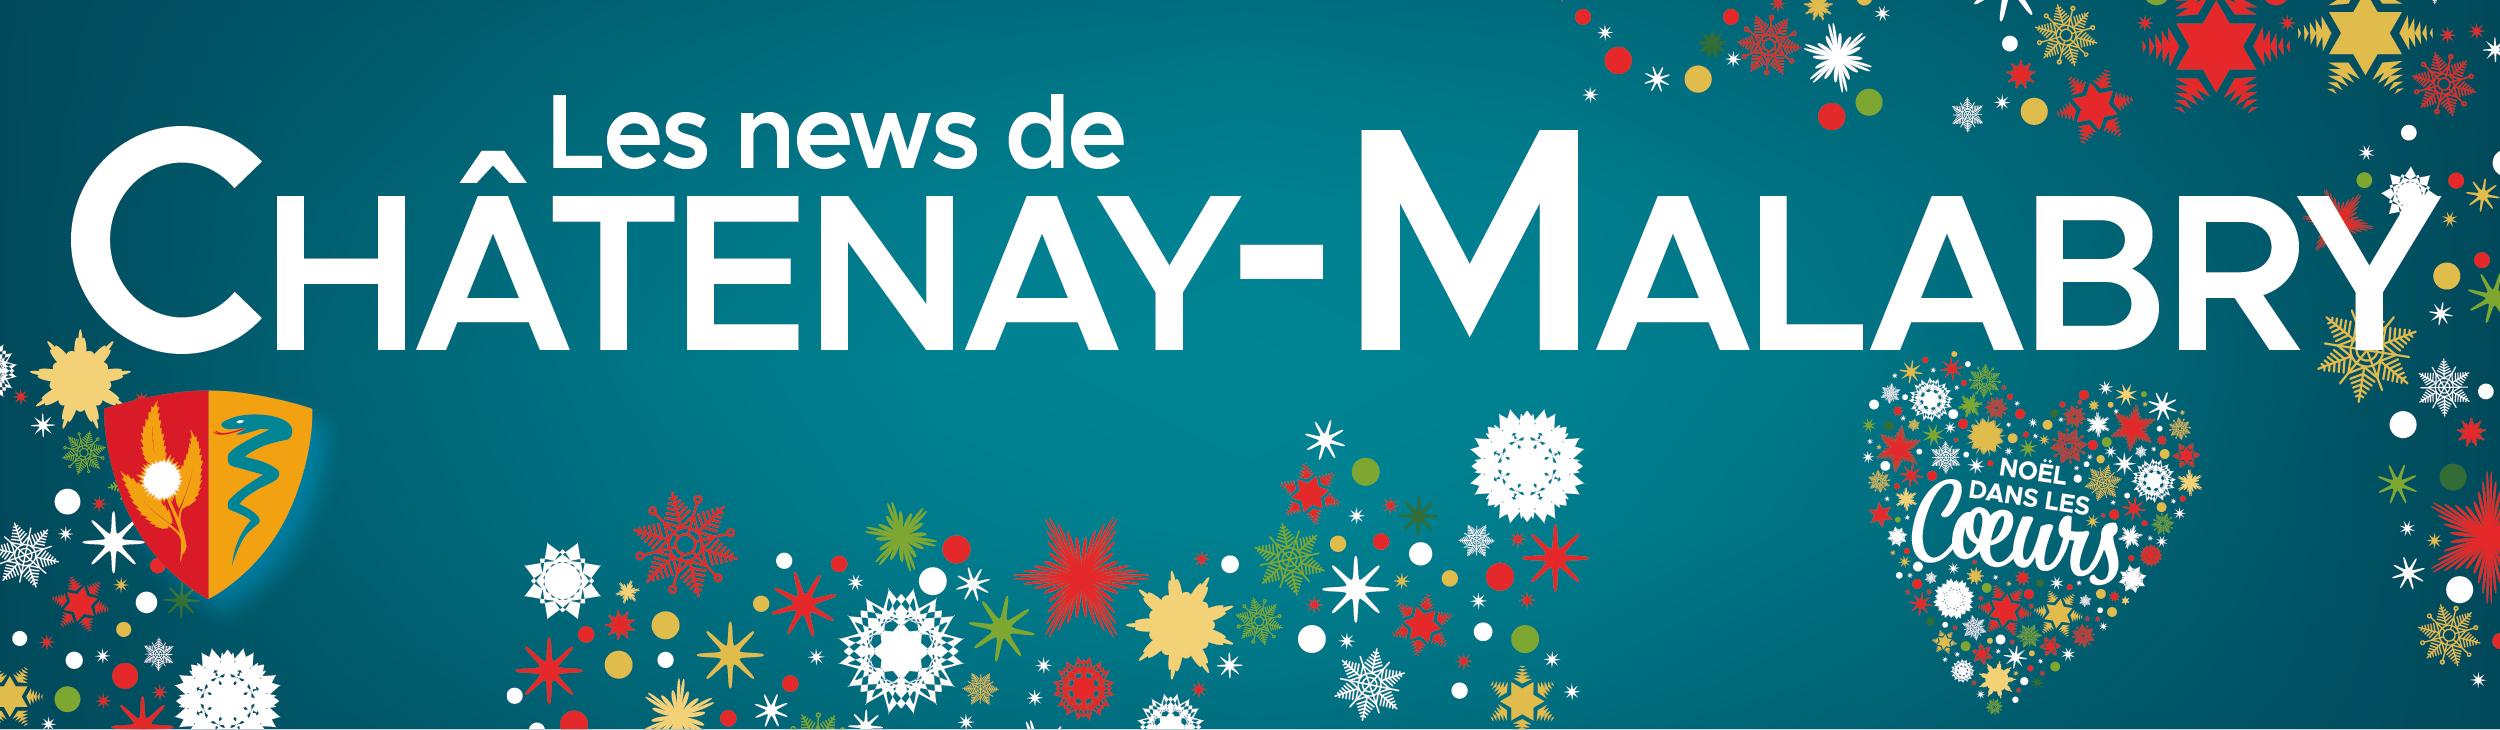 Les news de Châtenay-Malabry